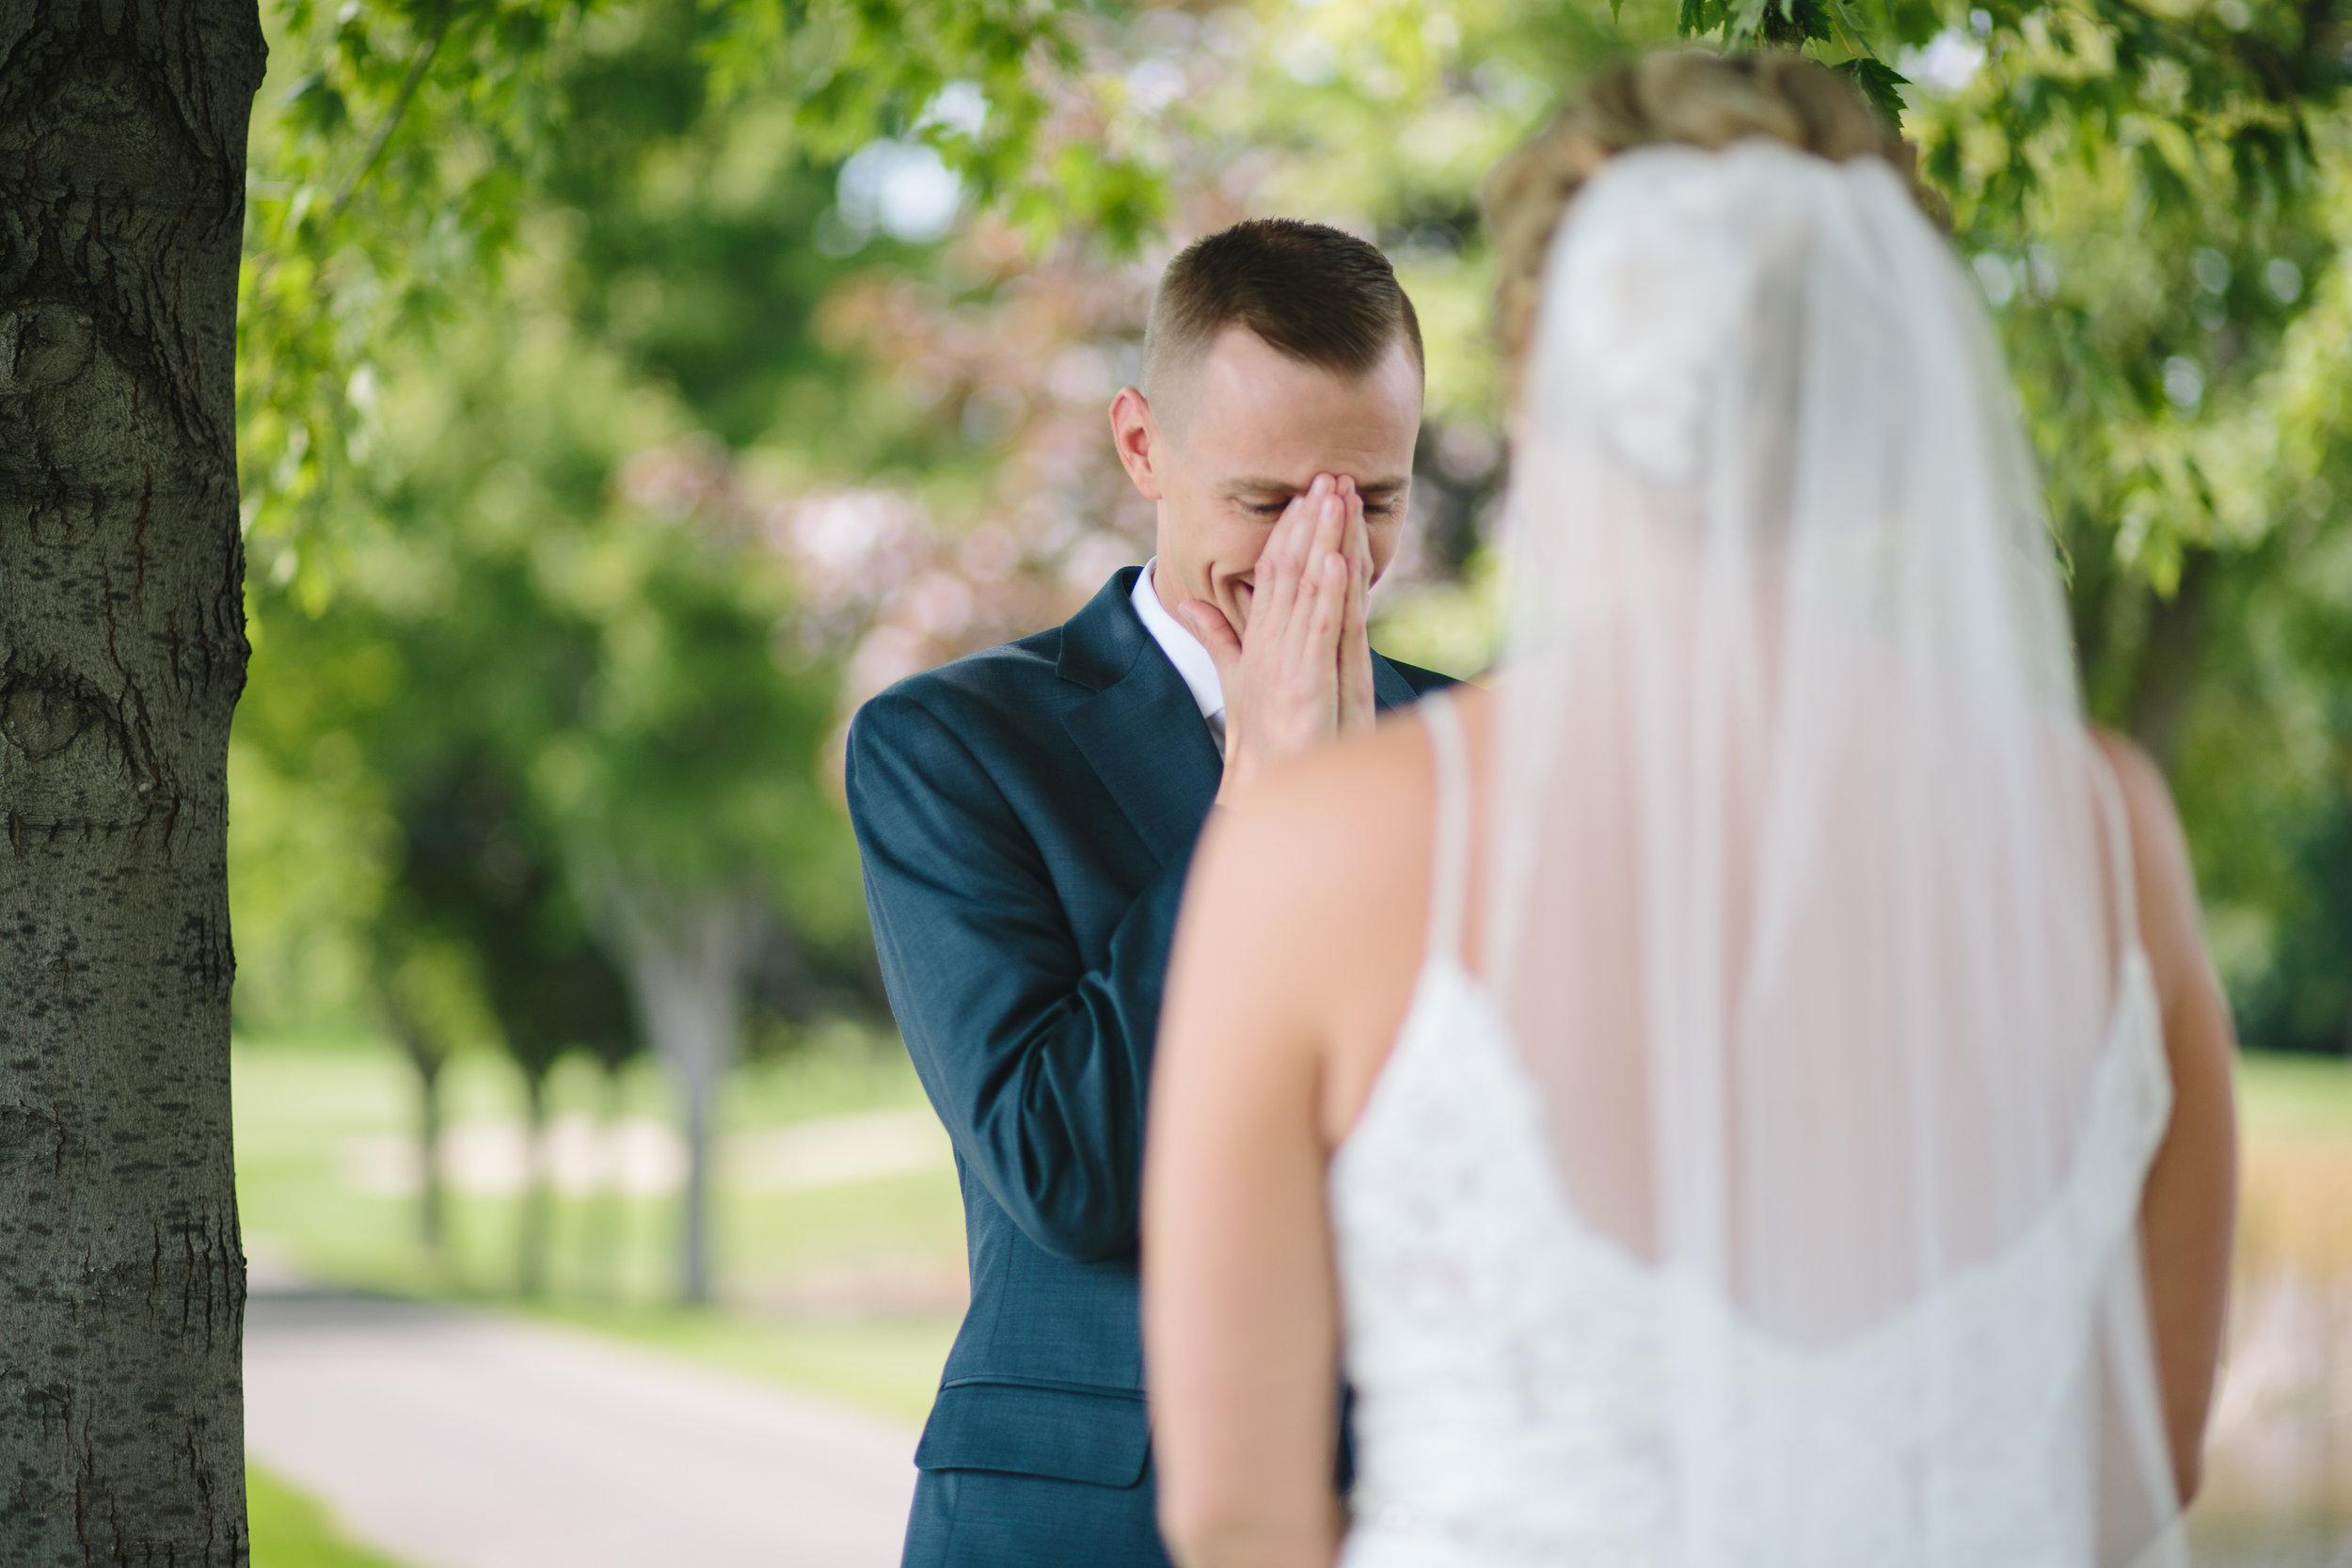 FAVORITES-2017.09.02 Eisenmenger_Sather Wedding-47.jpg